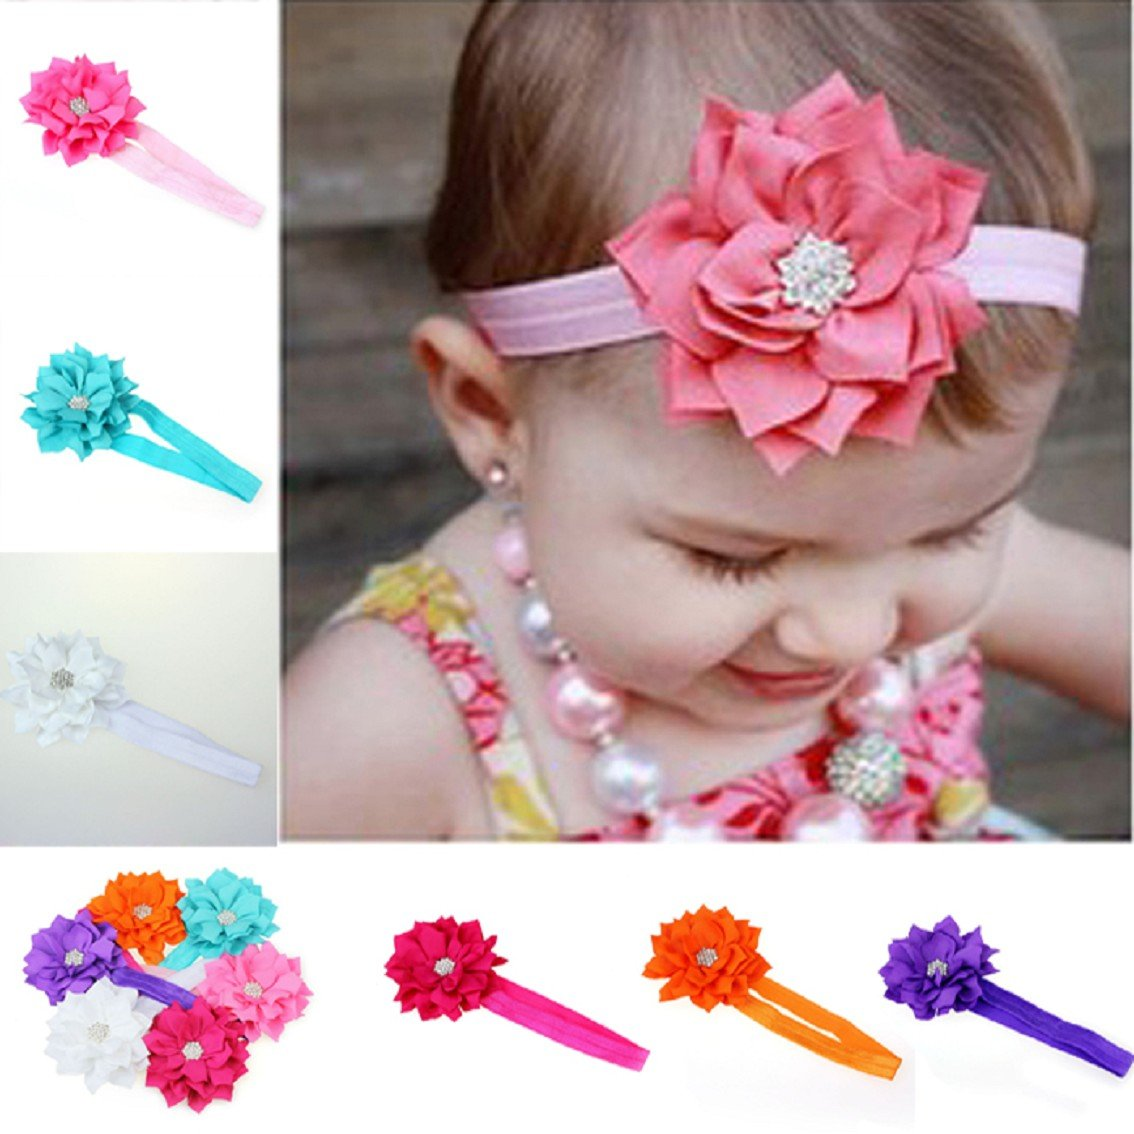 Malloom® 6 Pieces Babys Girls Headband Head Wear Crystal Lotus Flower Hairband Mallom®